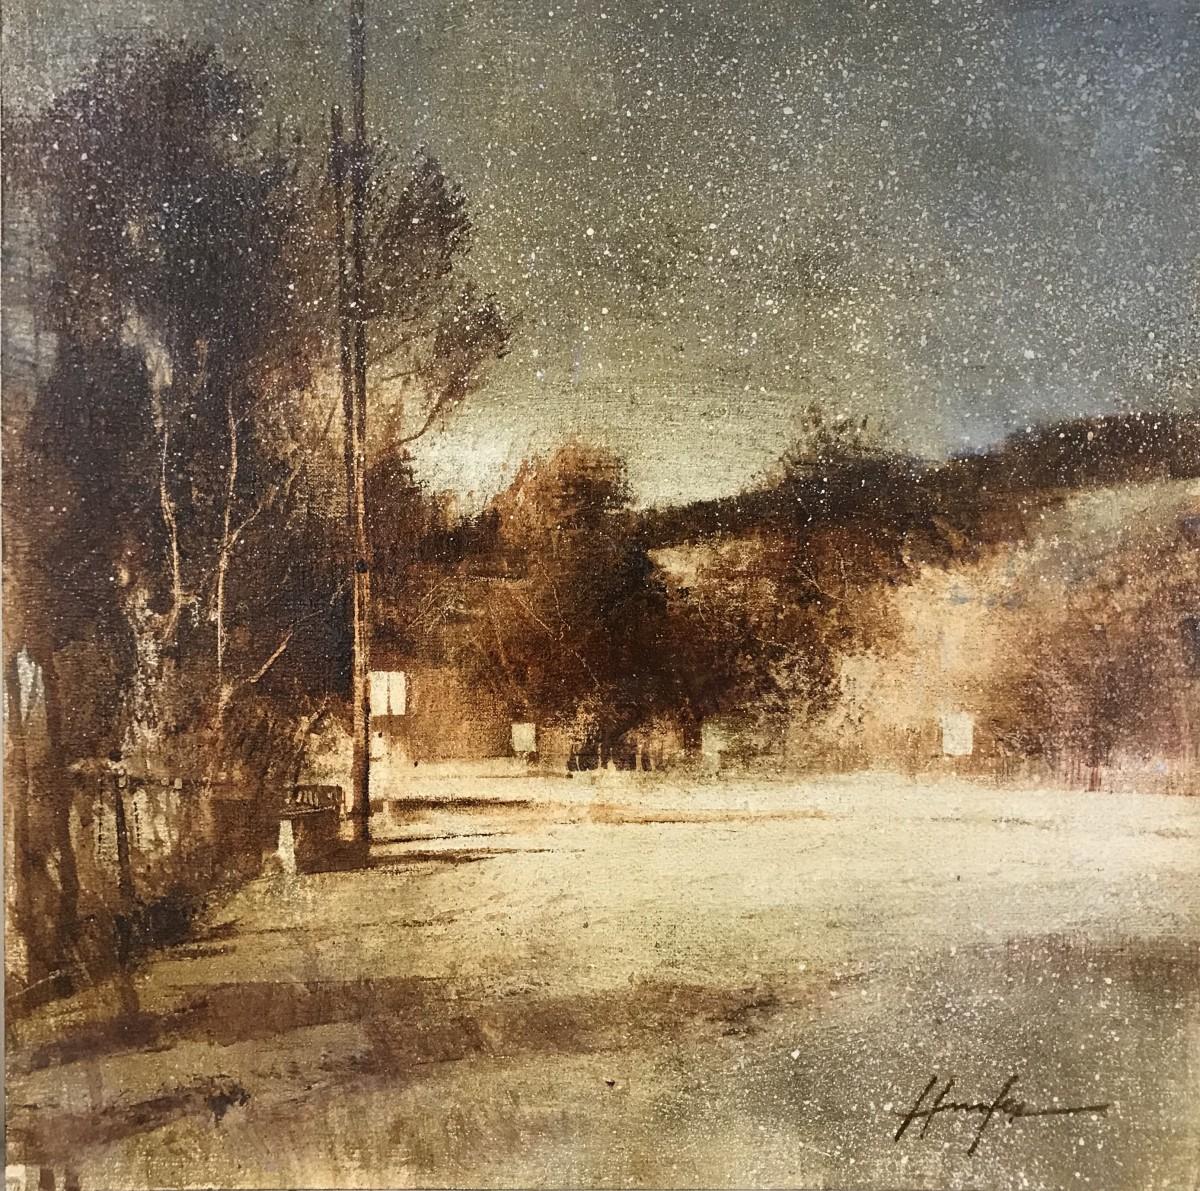 OUTSIDE SILVERADO